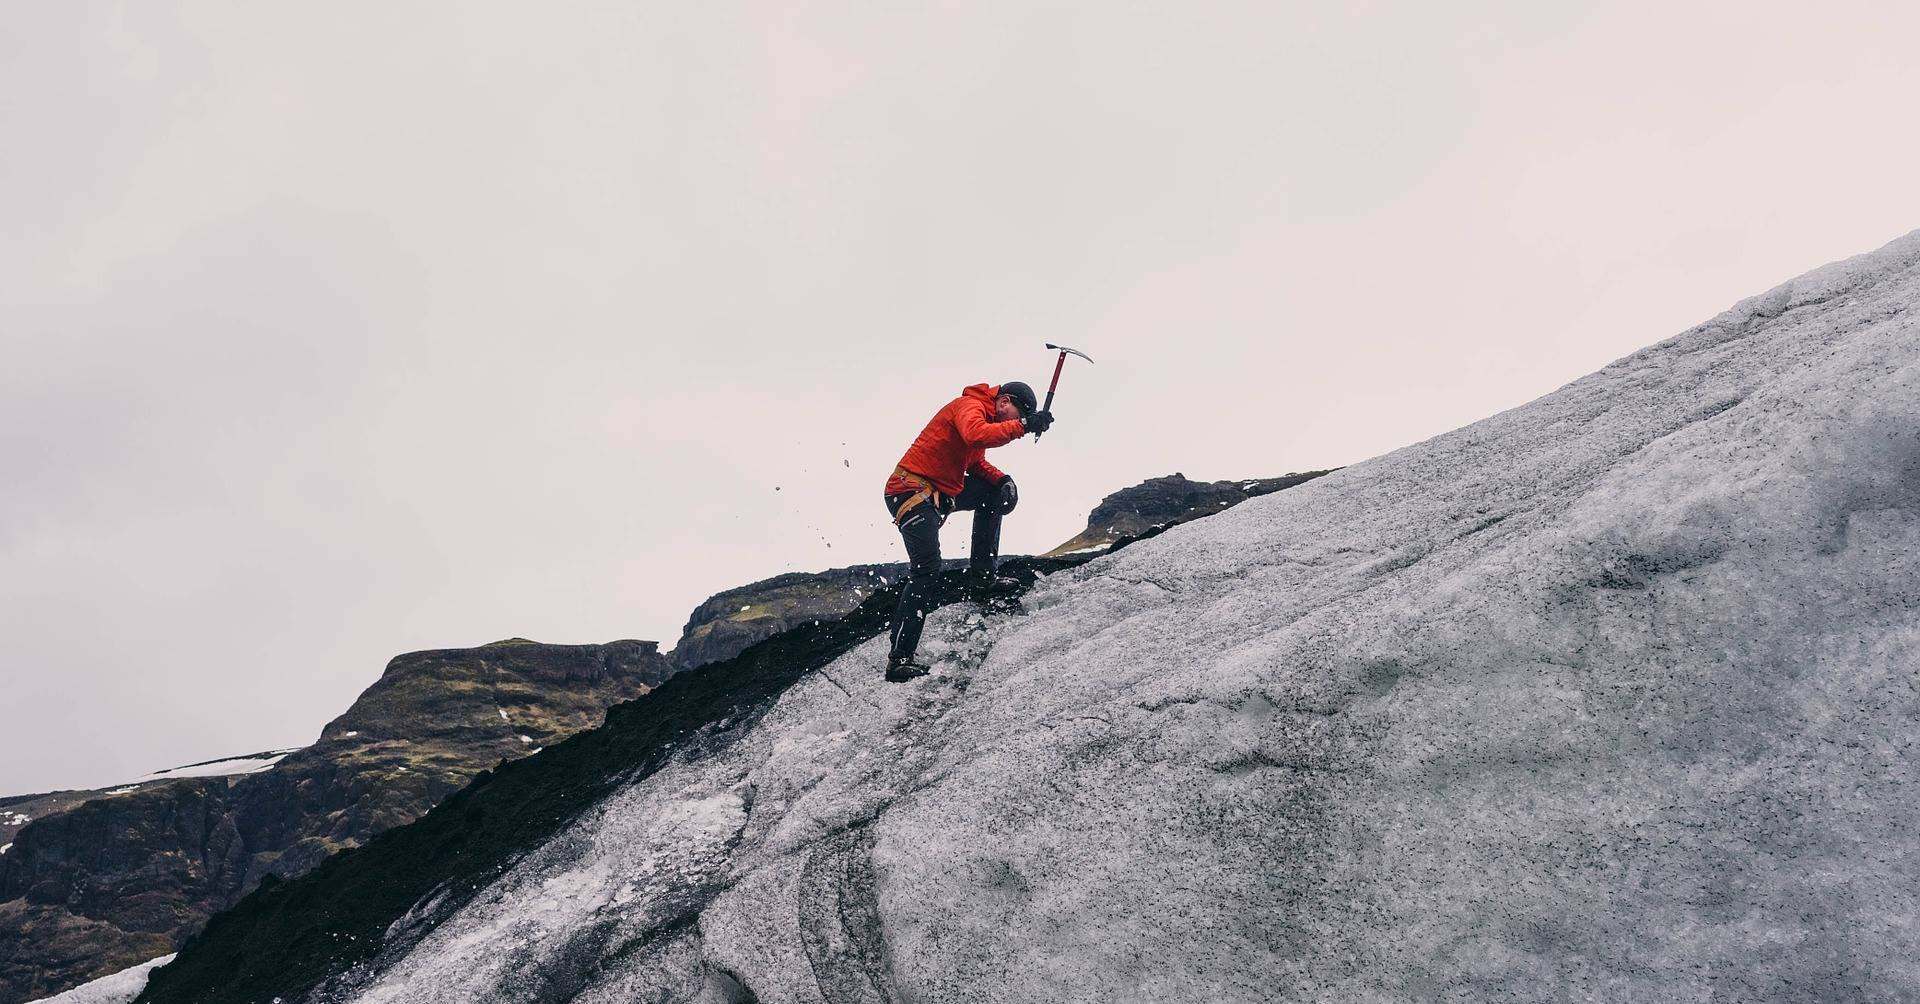 Bosskills – 60 вебинаров на развитие управленческих компетенций (2017-2018)